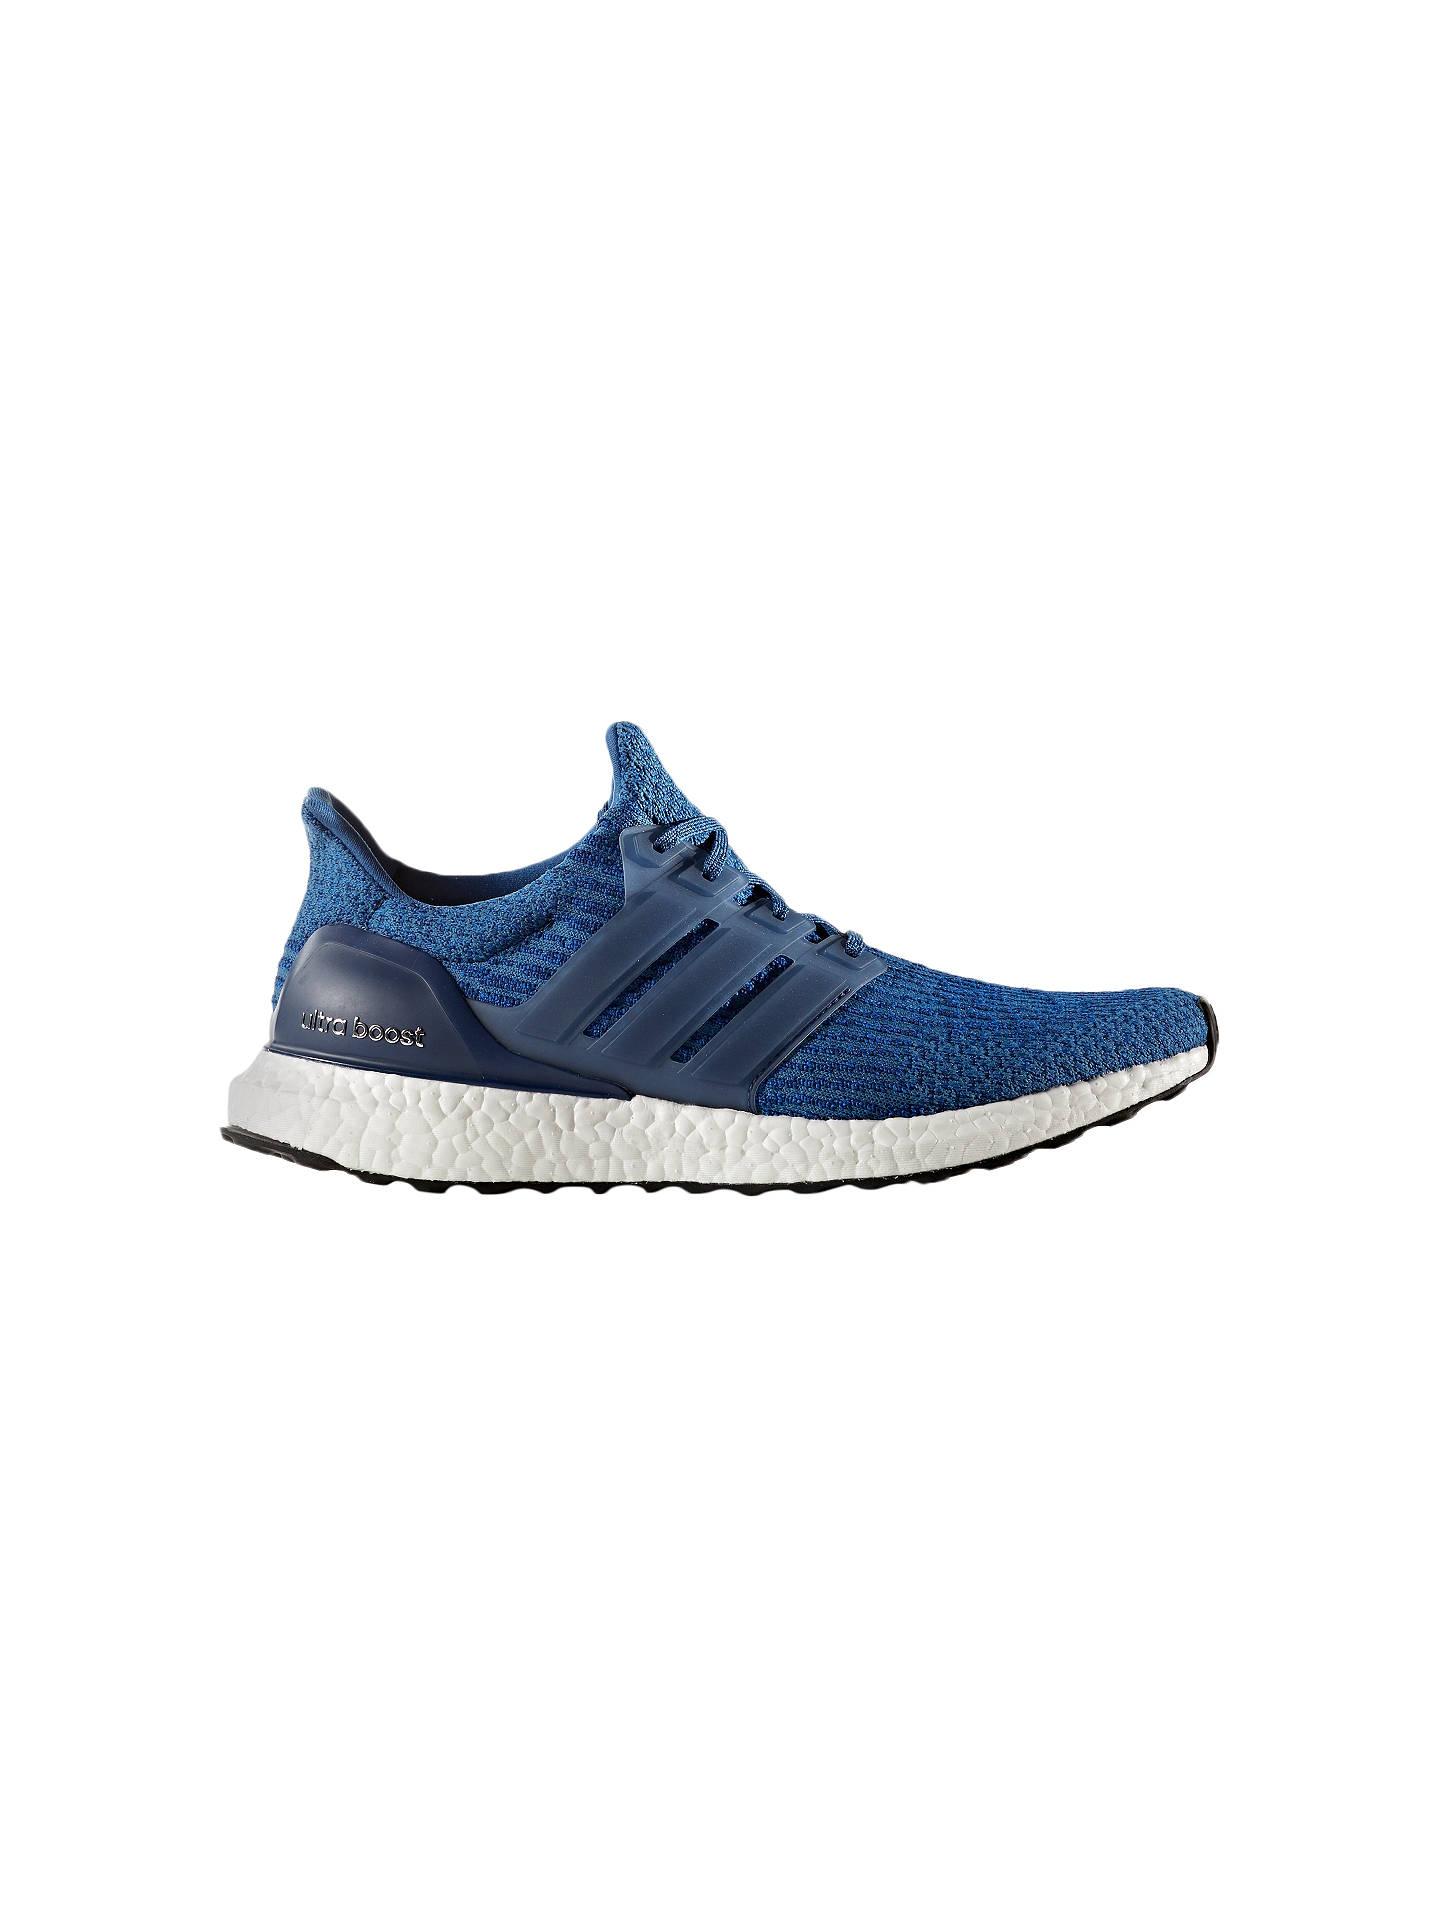 bb3d17187 Buy adidas Ultra Boost Men s Running Shoes